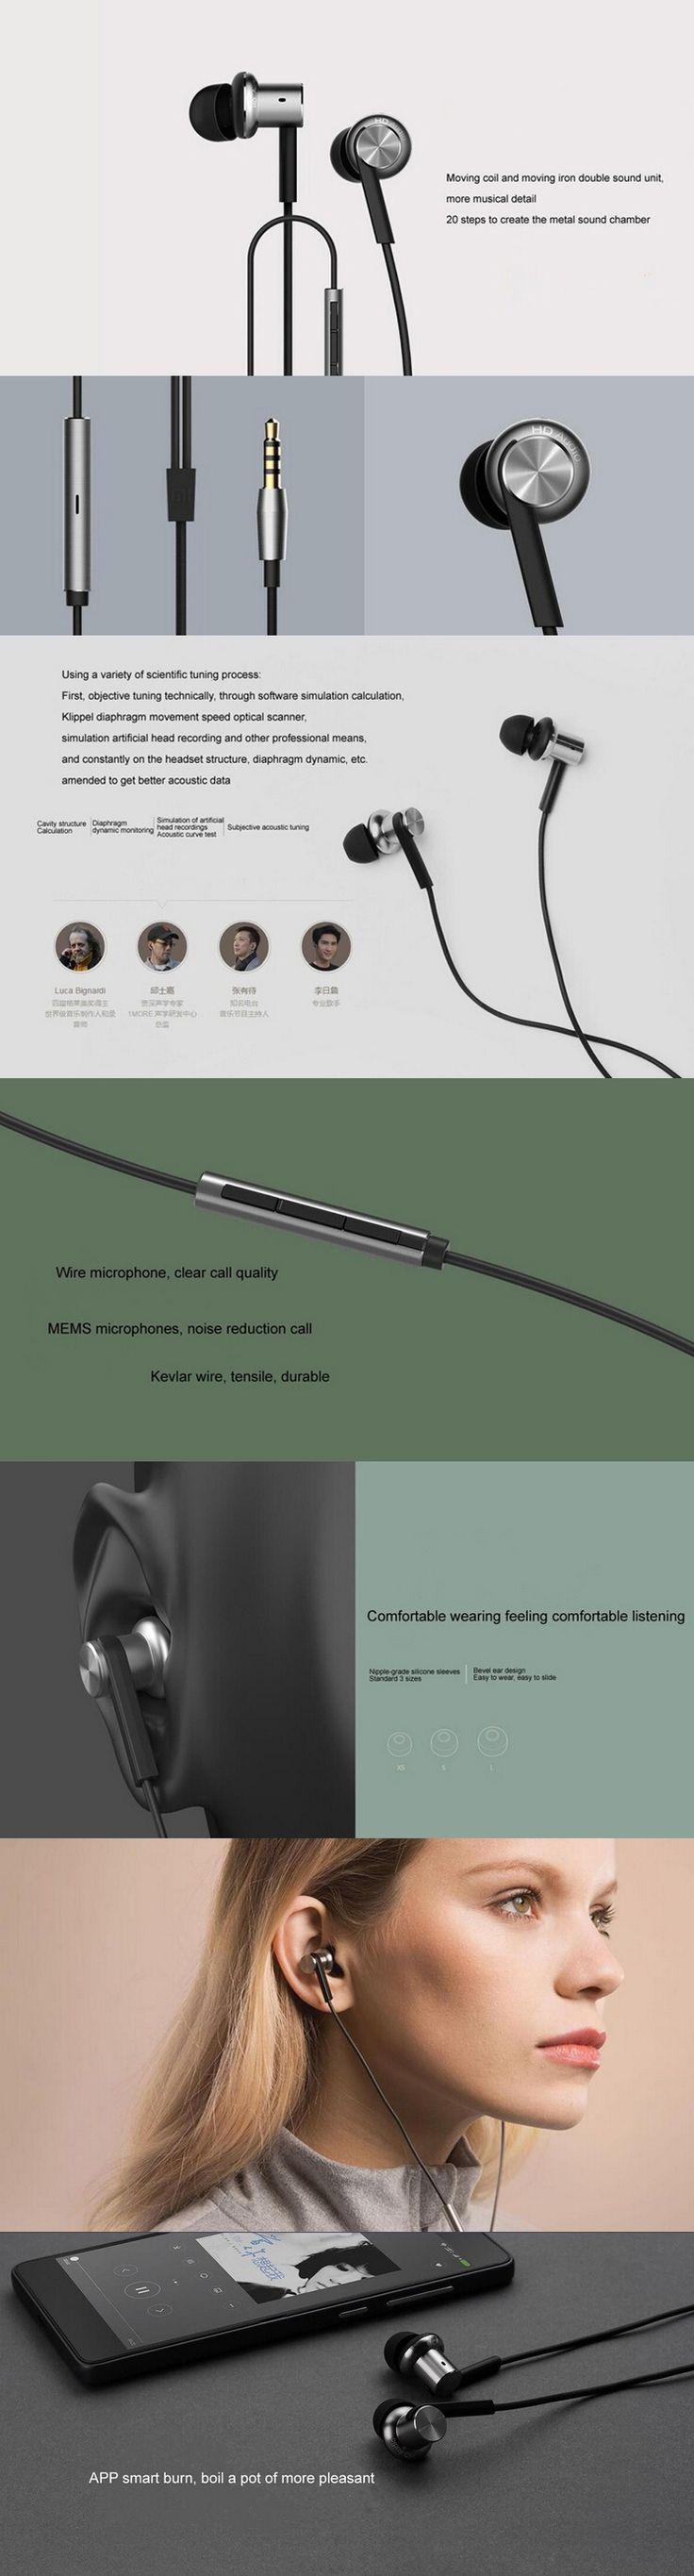 Xiaomi Hybrid Earphone 2 Units In-Ear HiFi Earphone Piston Headphone